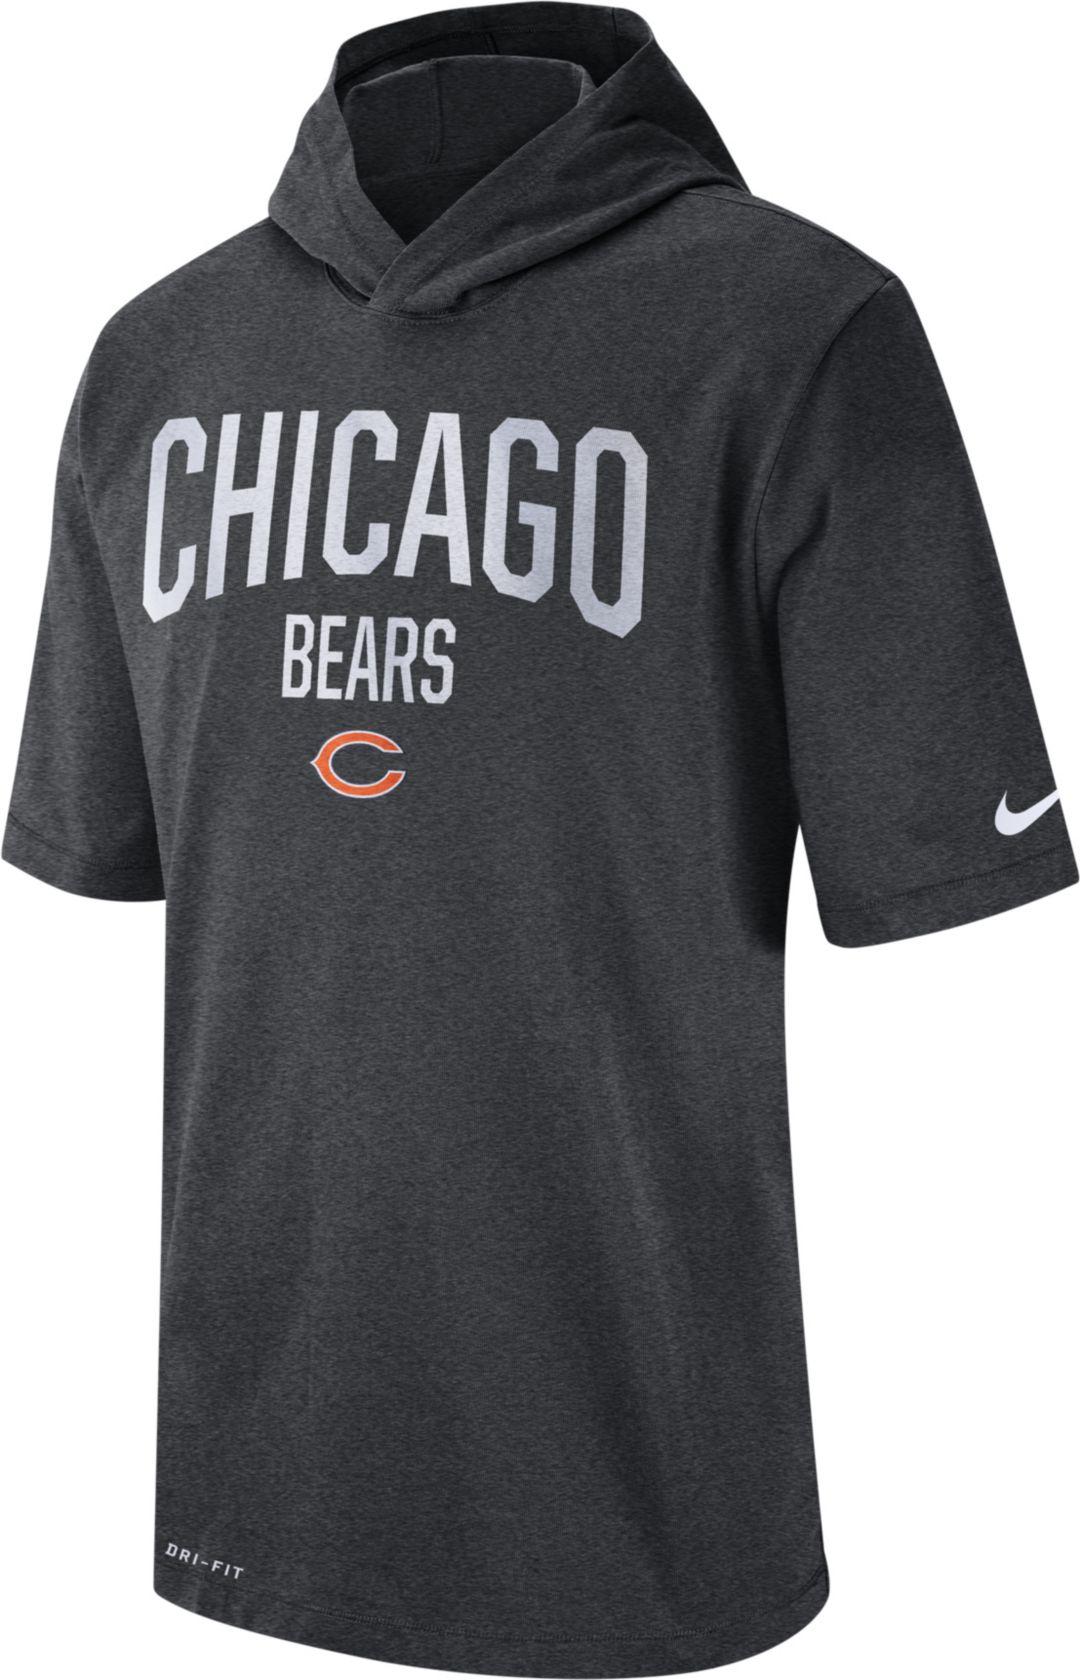 13cca2c3 Nike Men's Chicago Bears Sideline Charcoal Short-Sleeve Hoodie T-Shirt